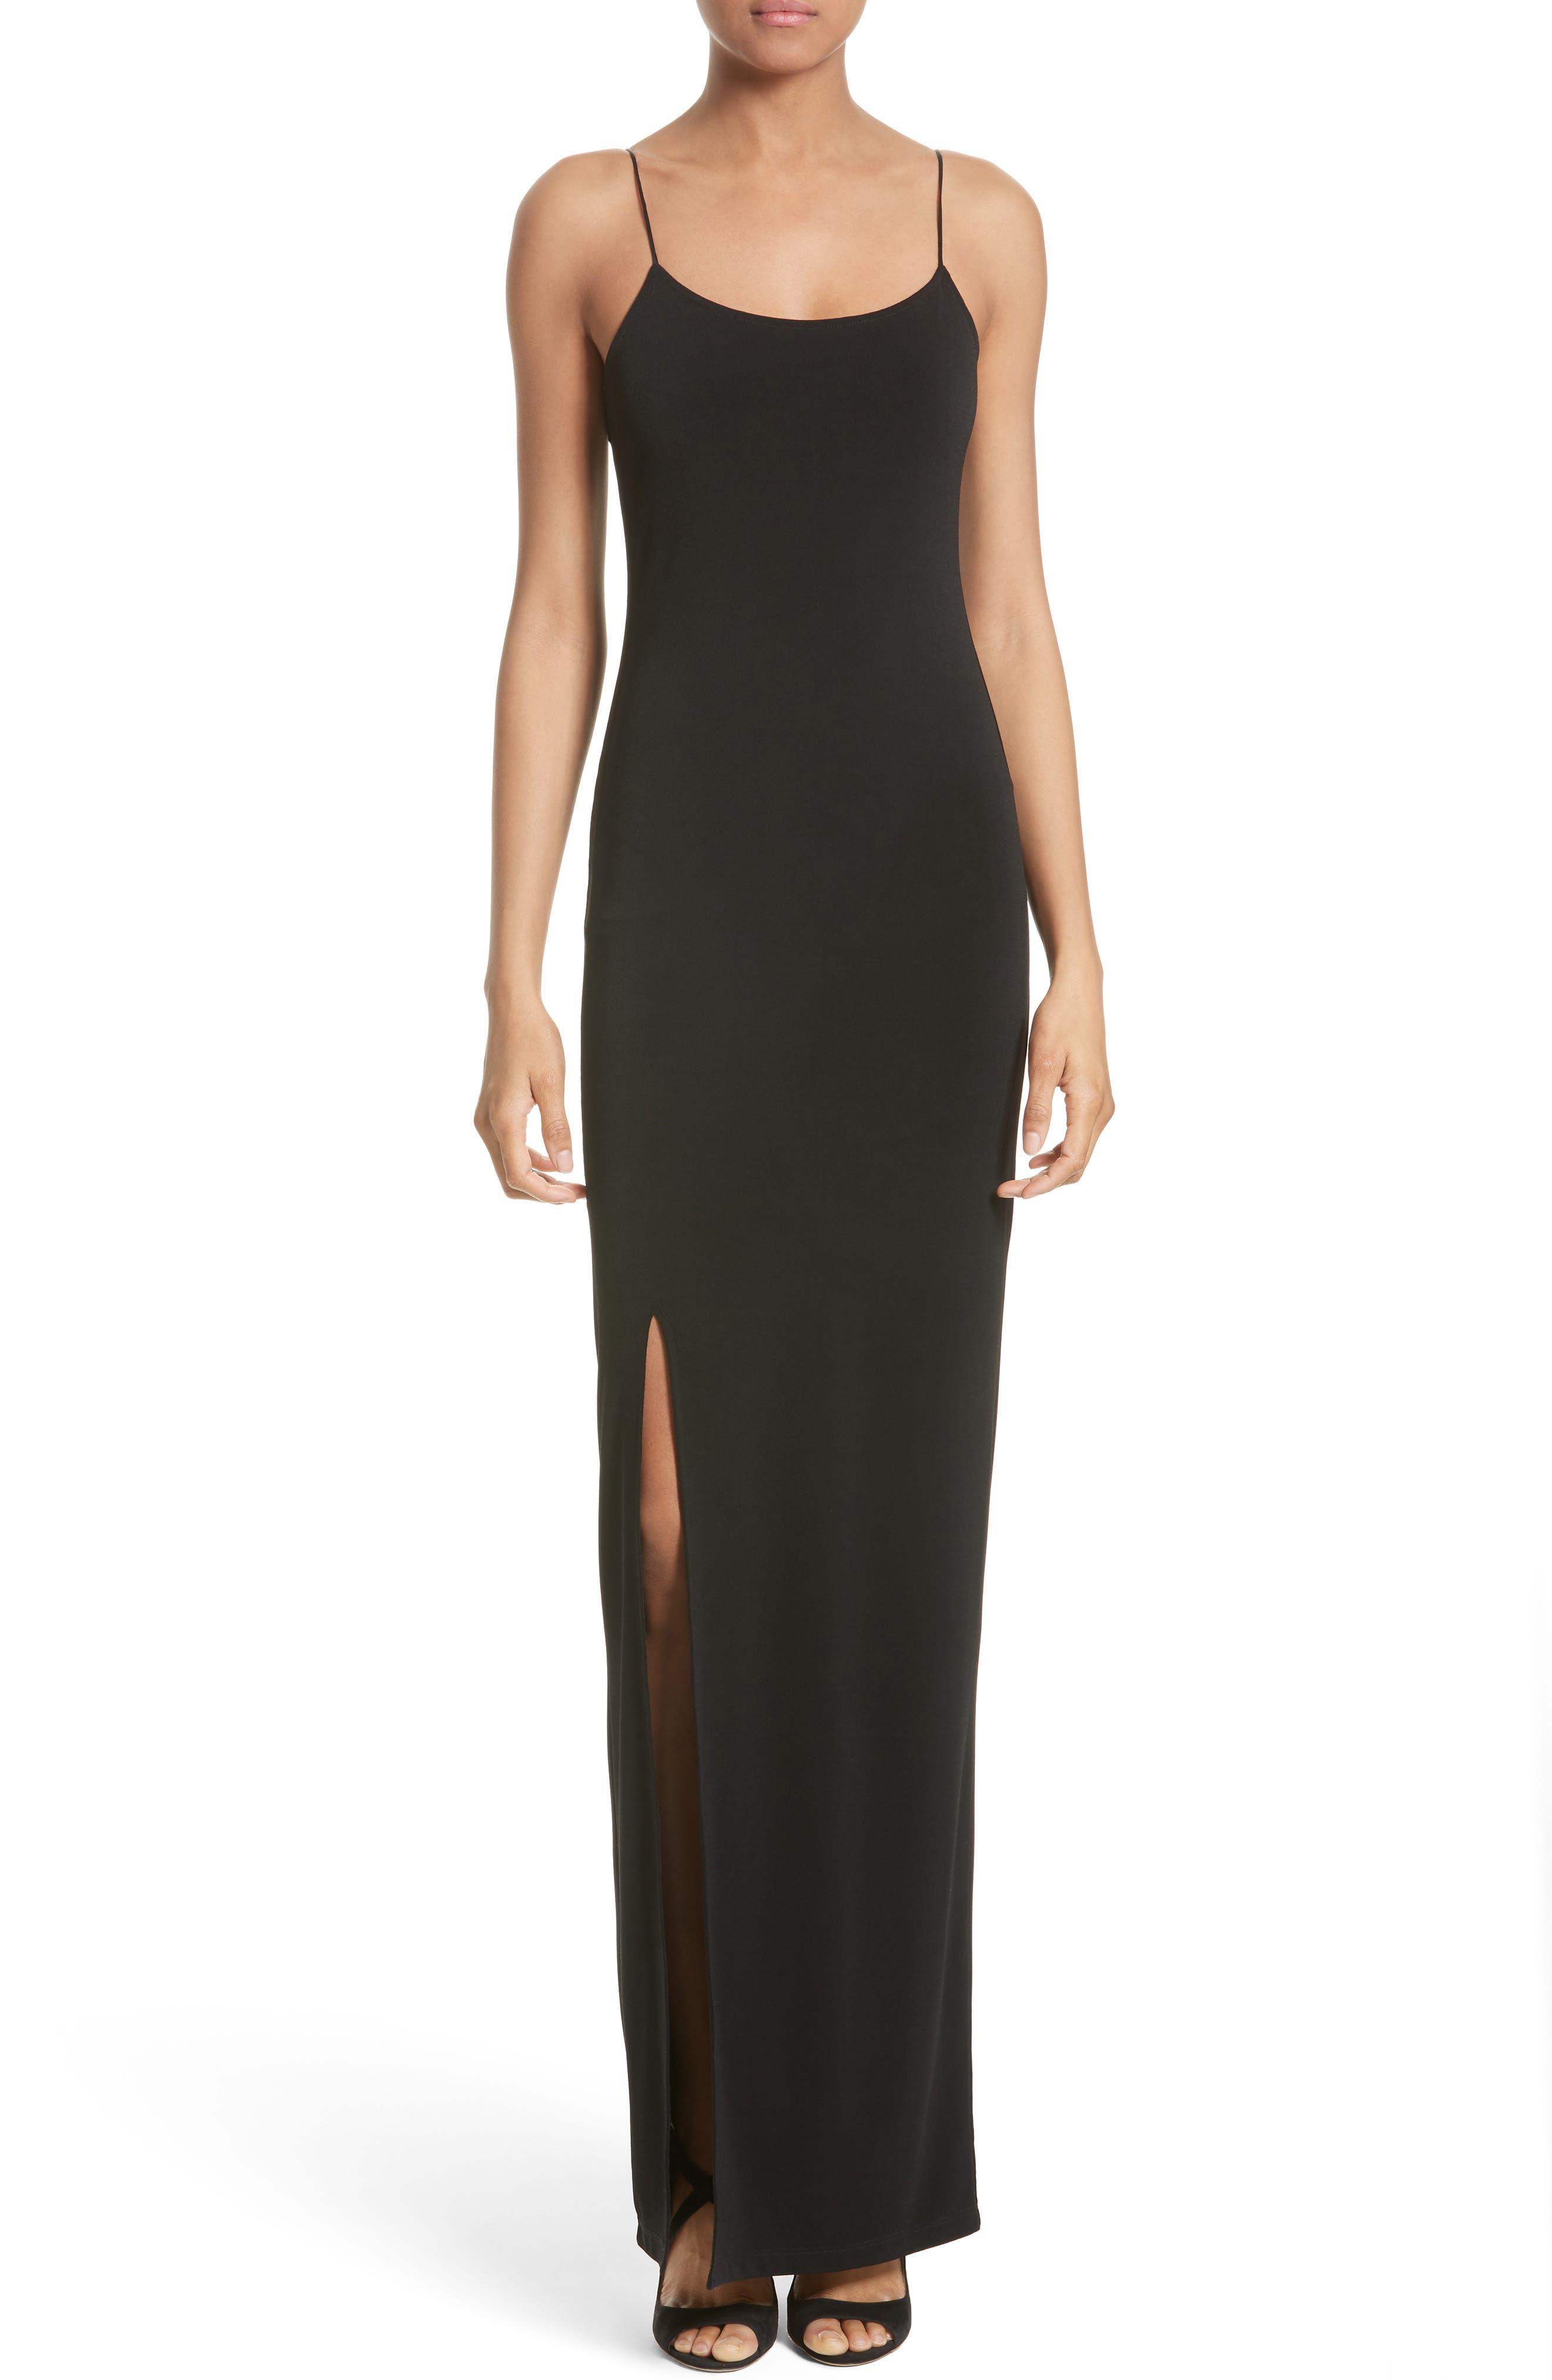 Alternate Image 1 Selected - Alice + Olivia Addie Stretch Knit Maxi Dress